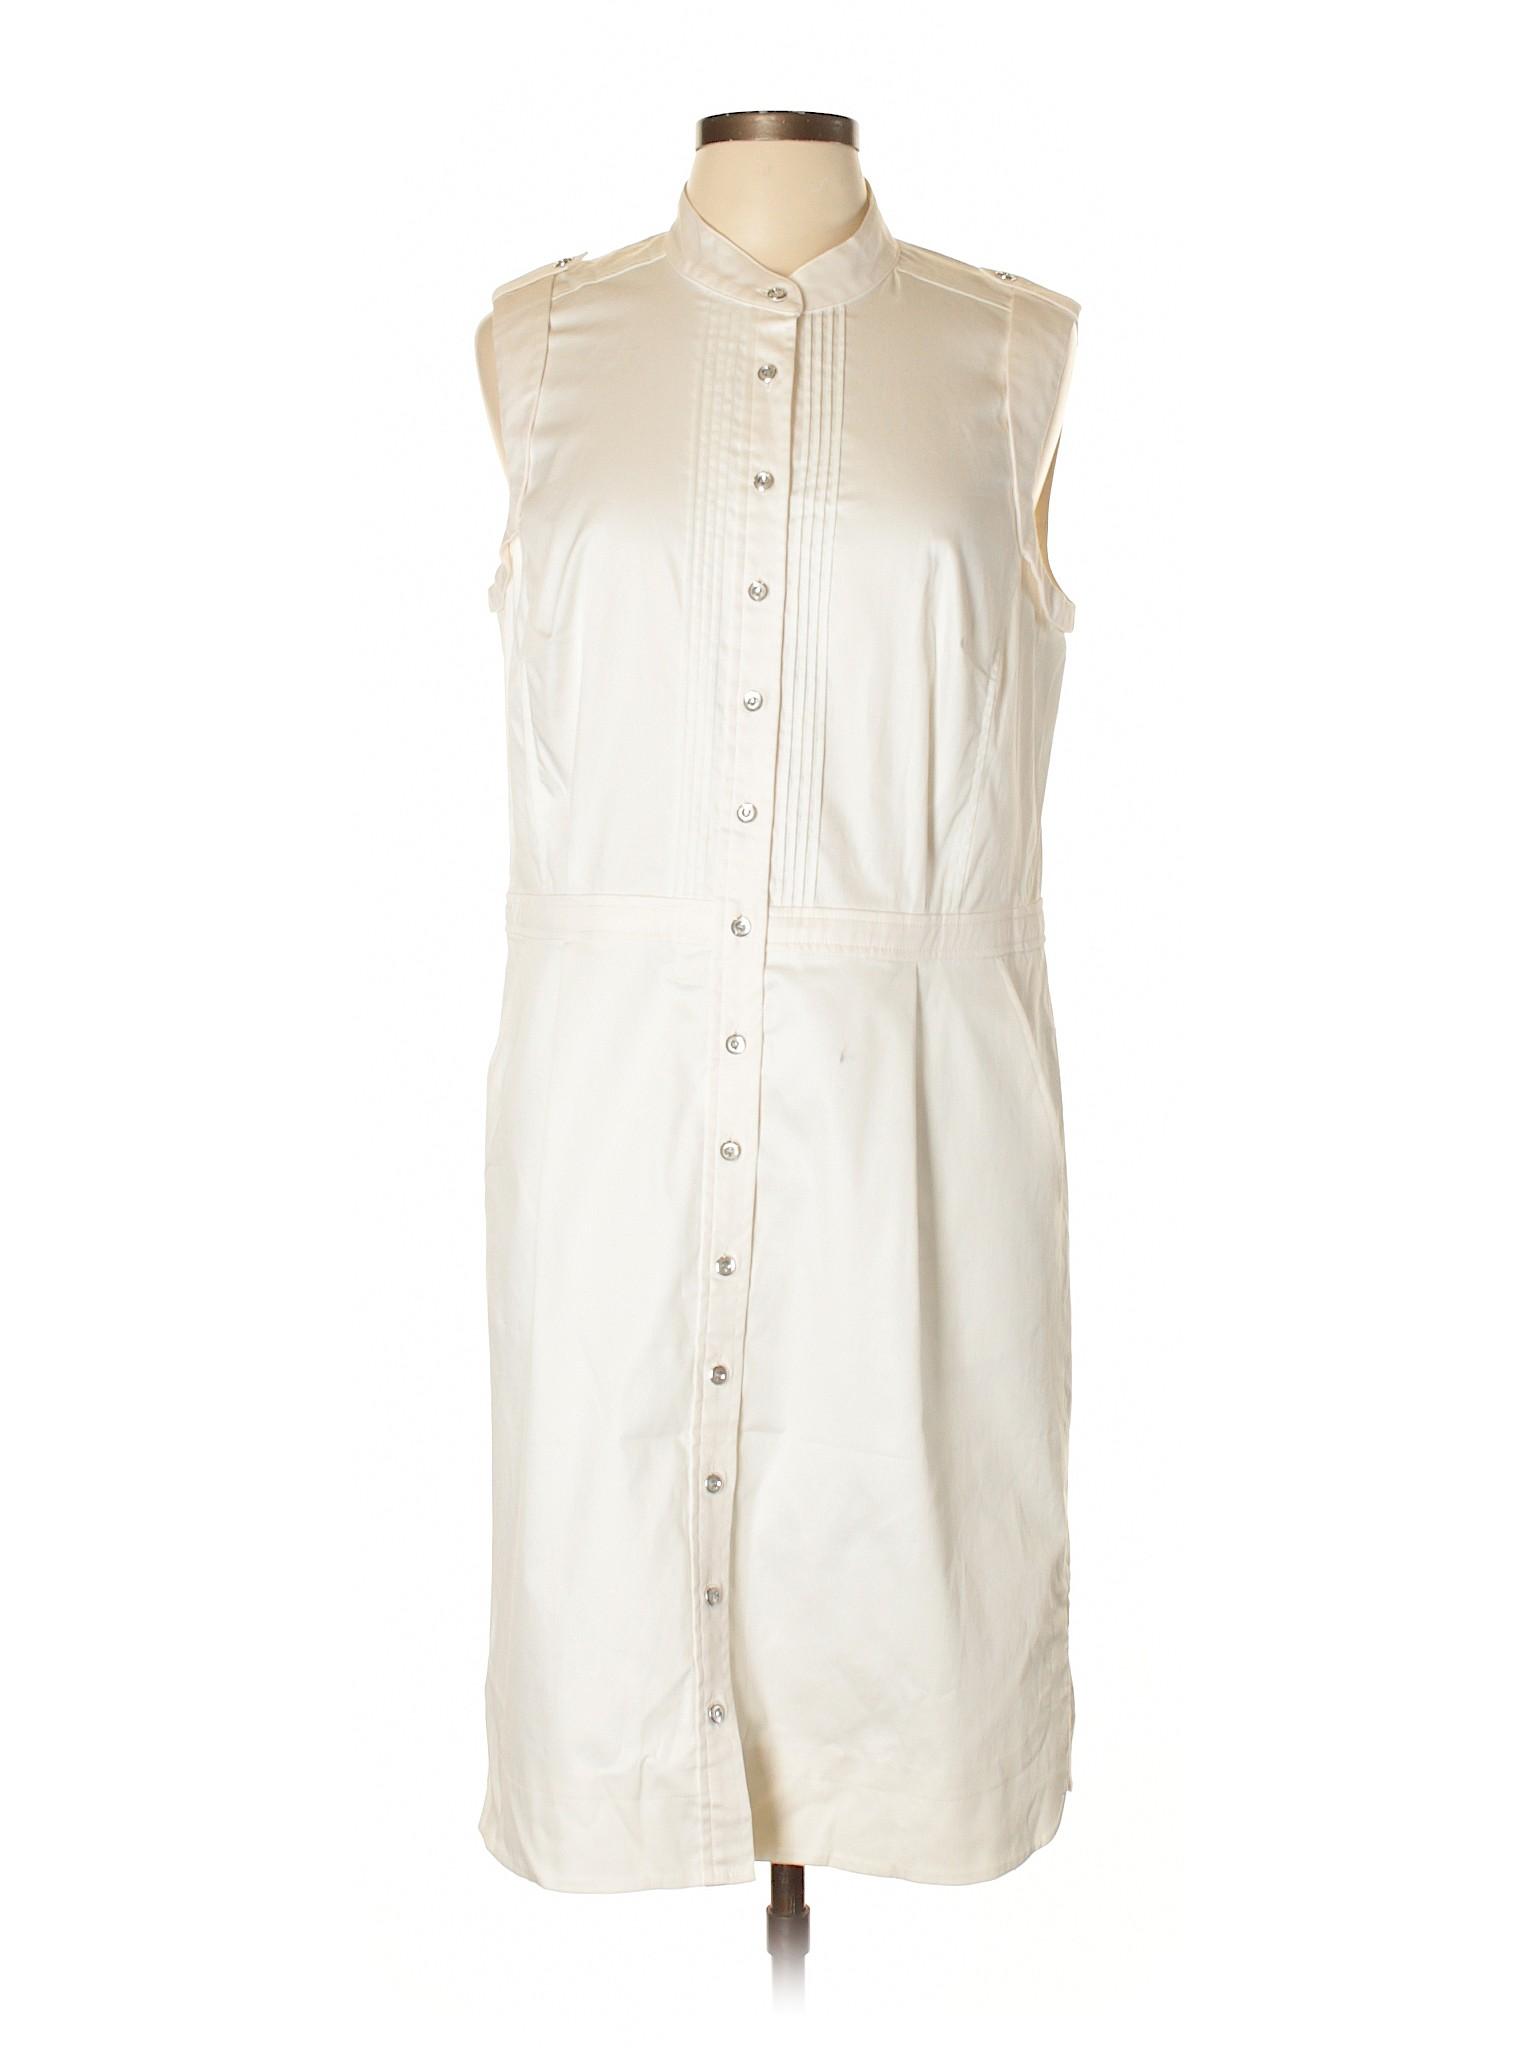 Casual Dress Dress Casual Etcetera Etcetera Selling Selling Selling Casual Selling Etcetera Dress Etcetera EZq6Pgn